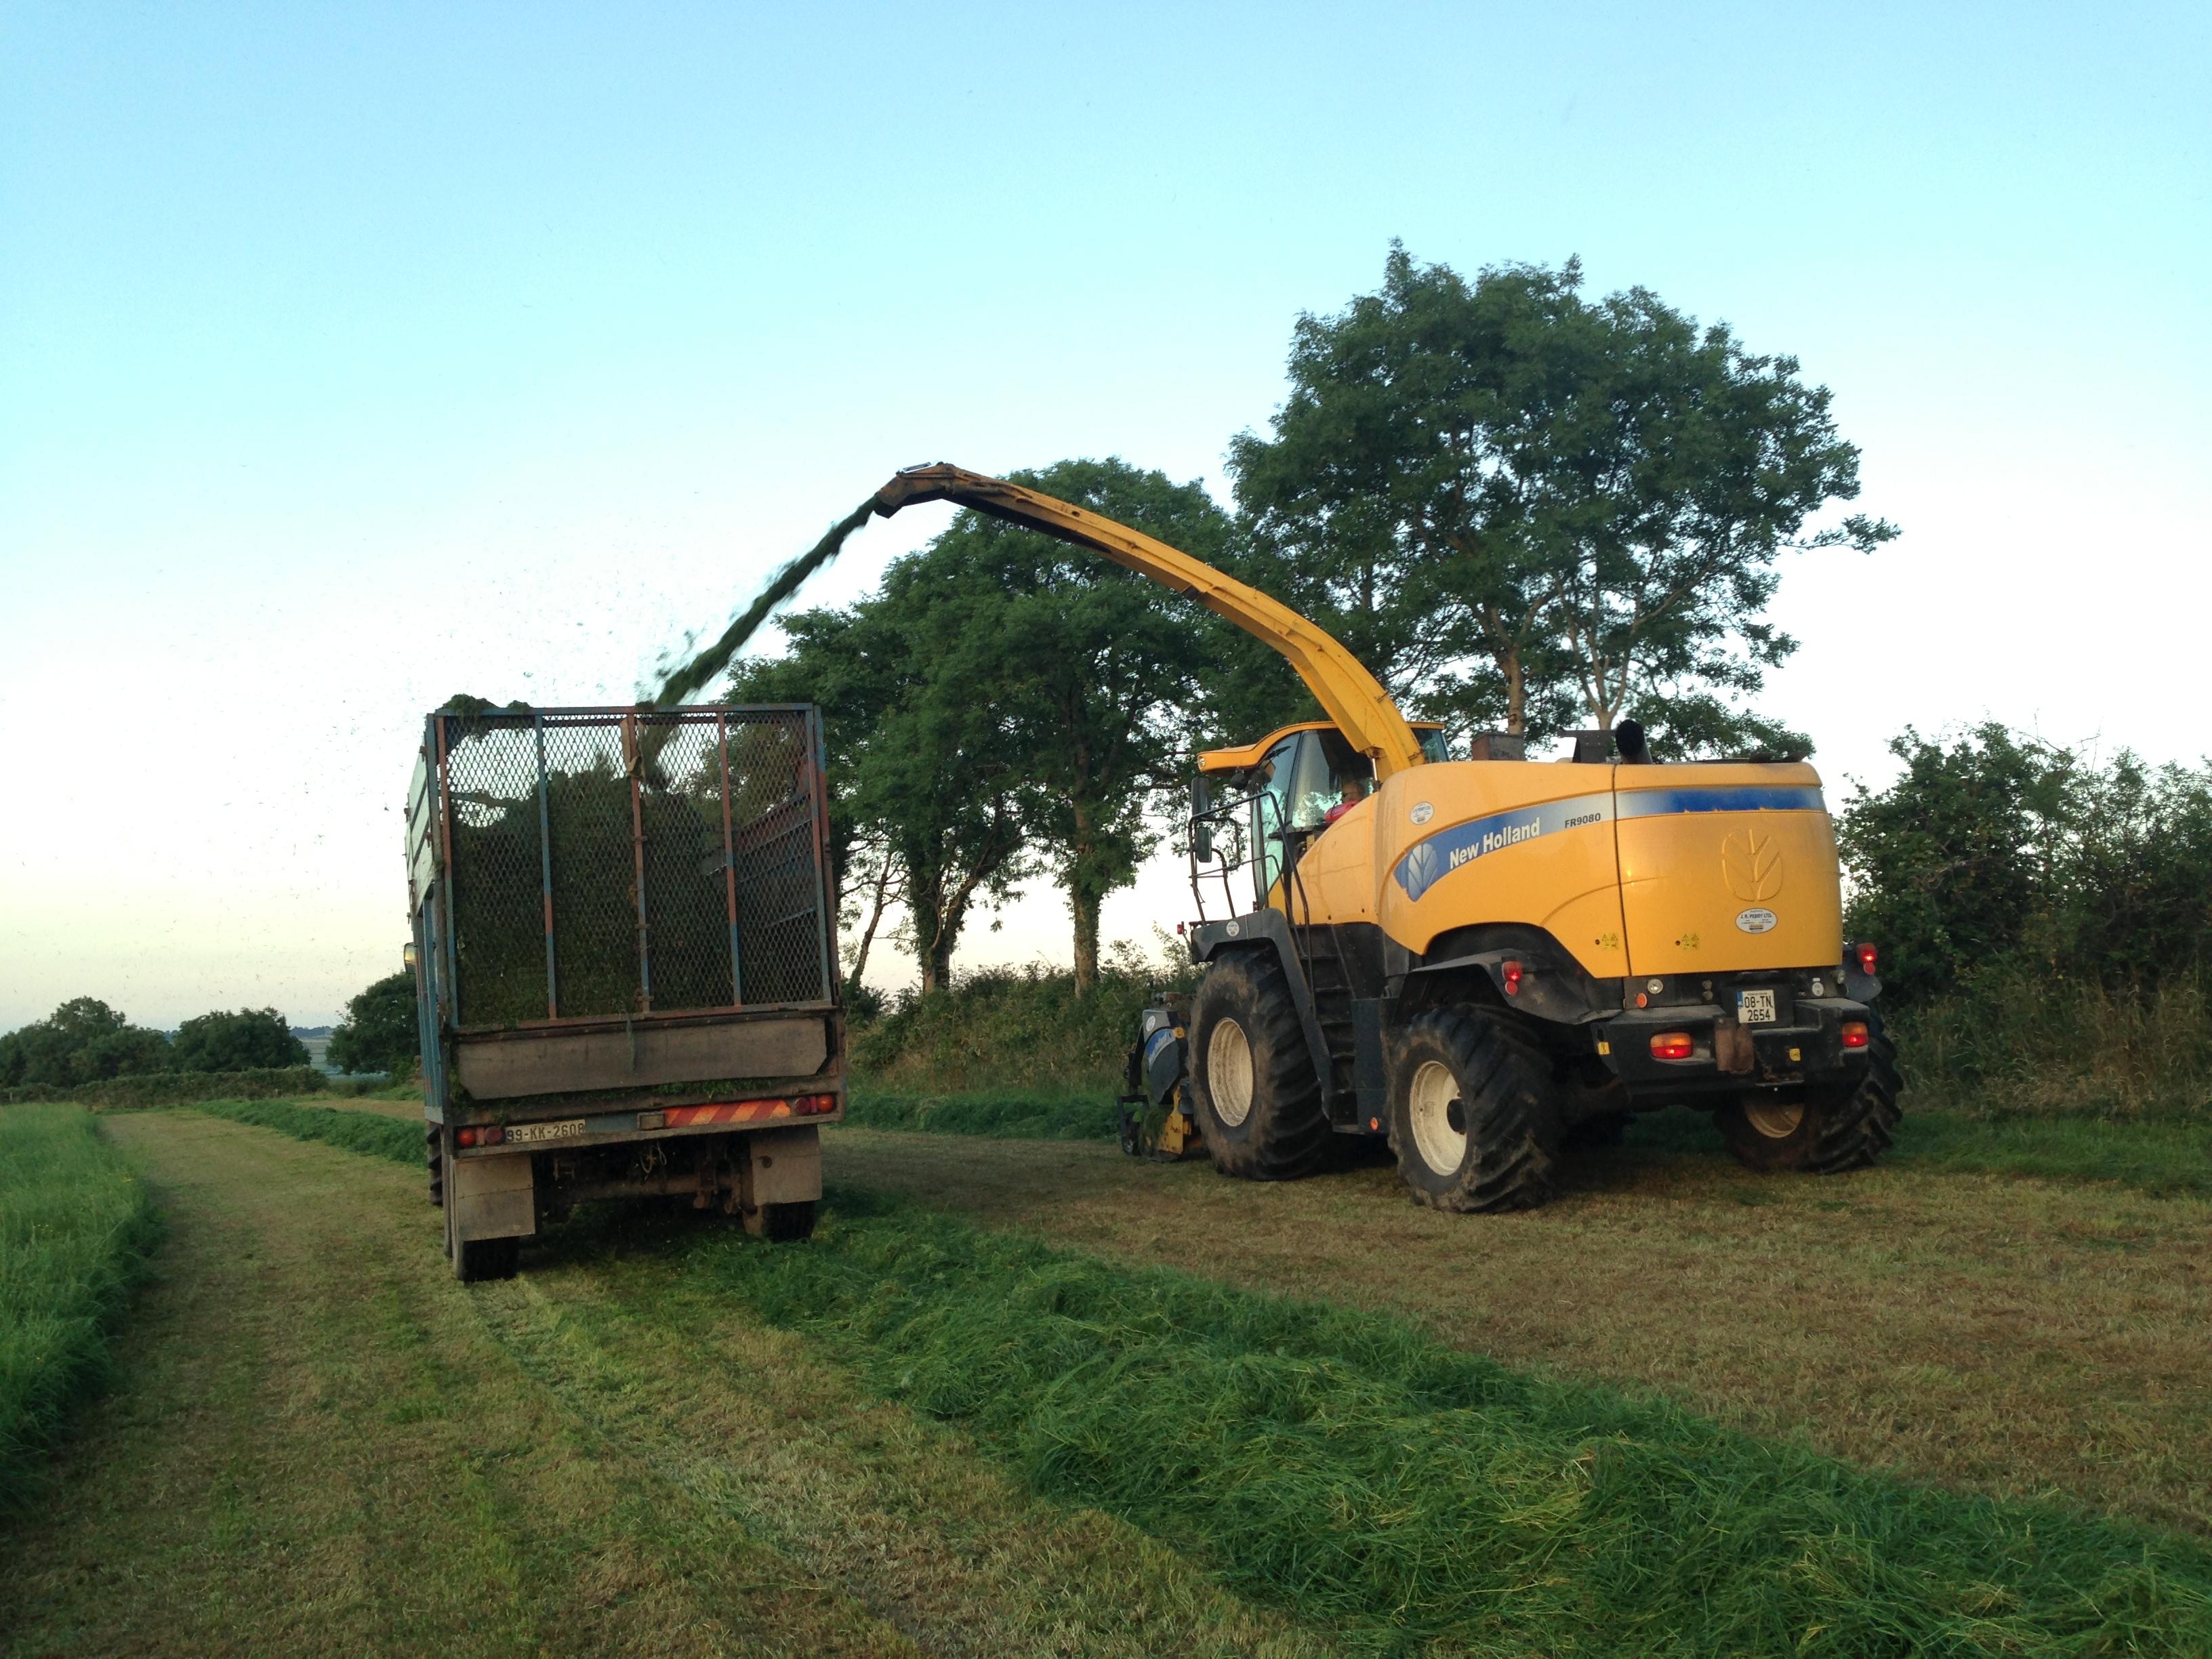 Silage Harvesting